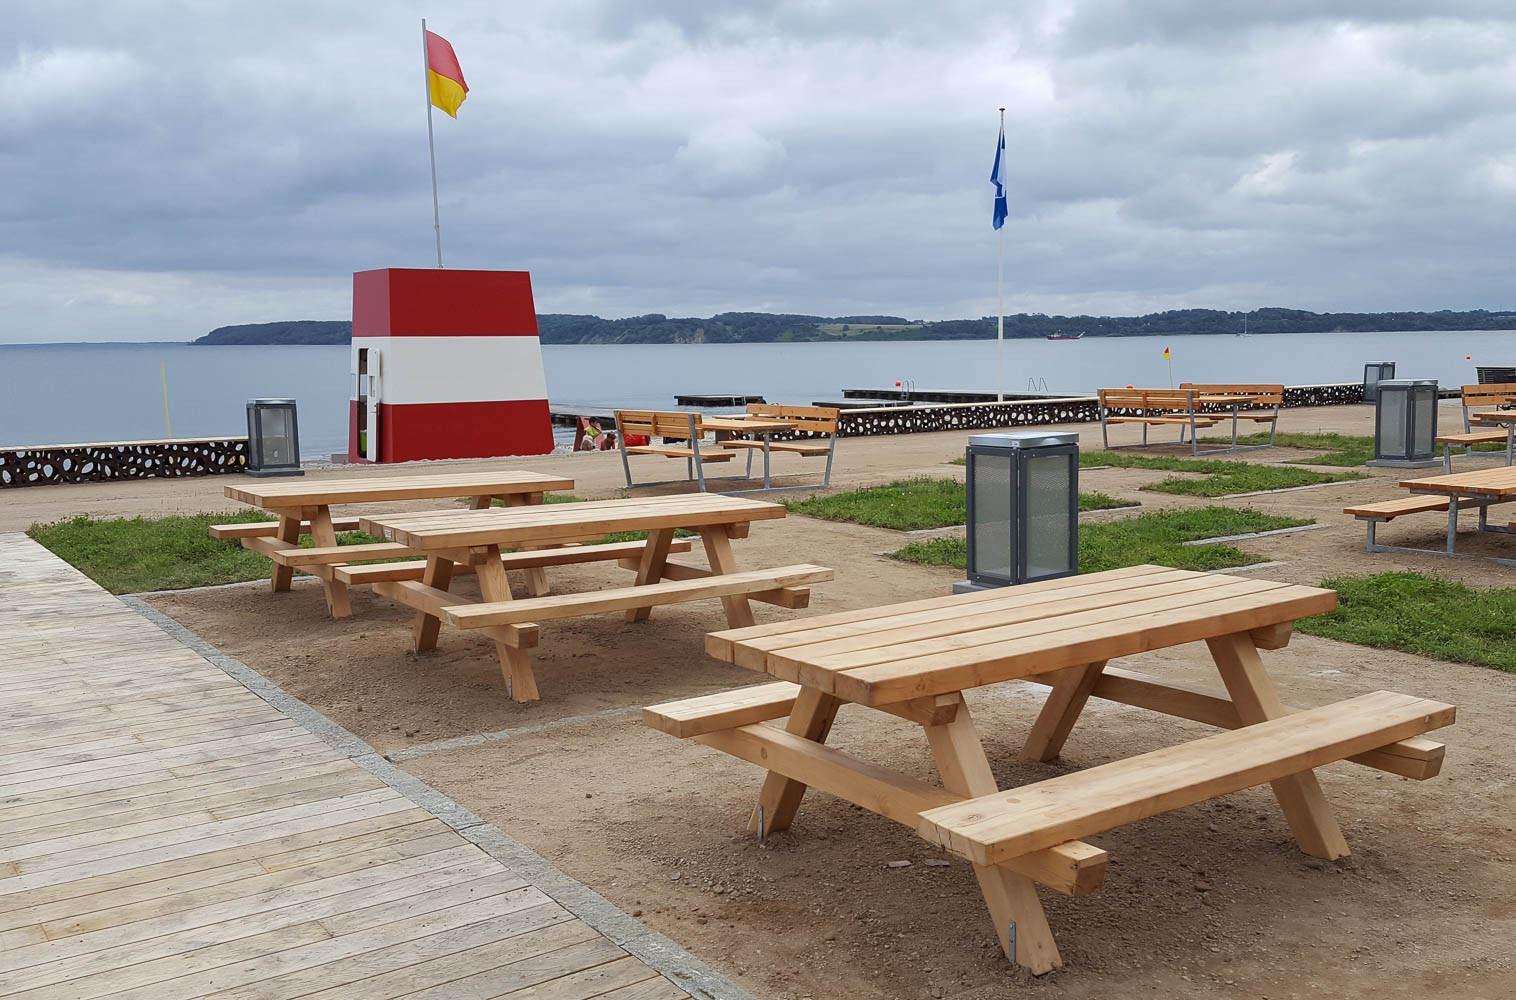 Roar havebord - bord-bænkesæt i holdbar robinietræ